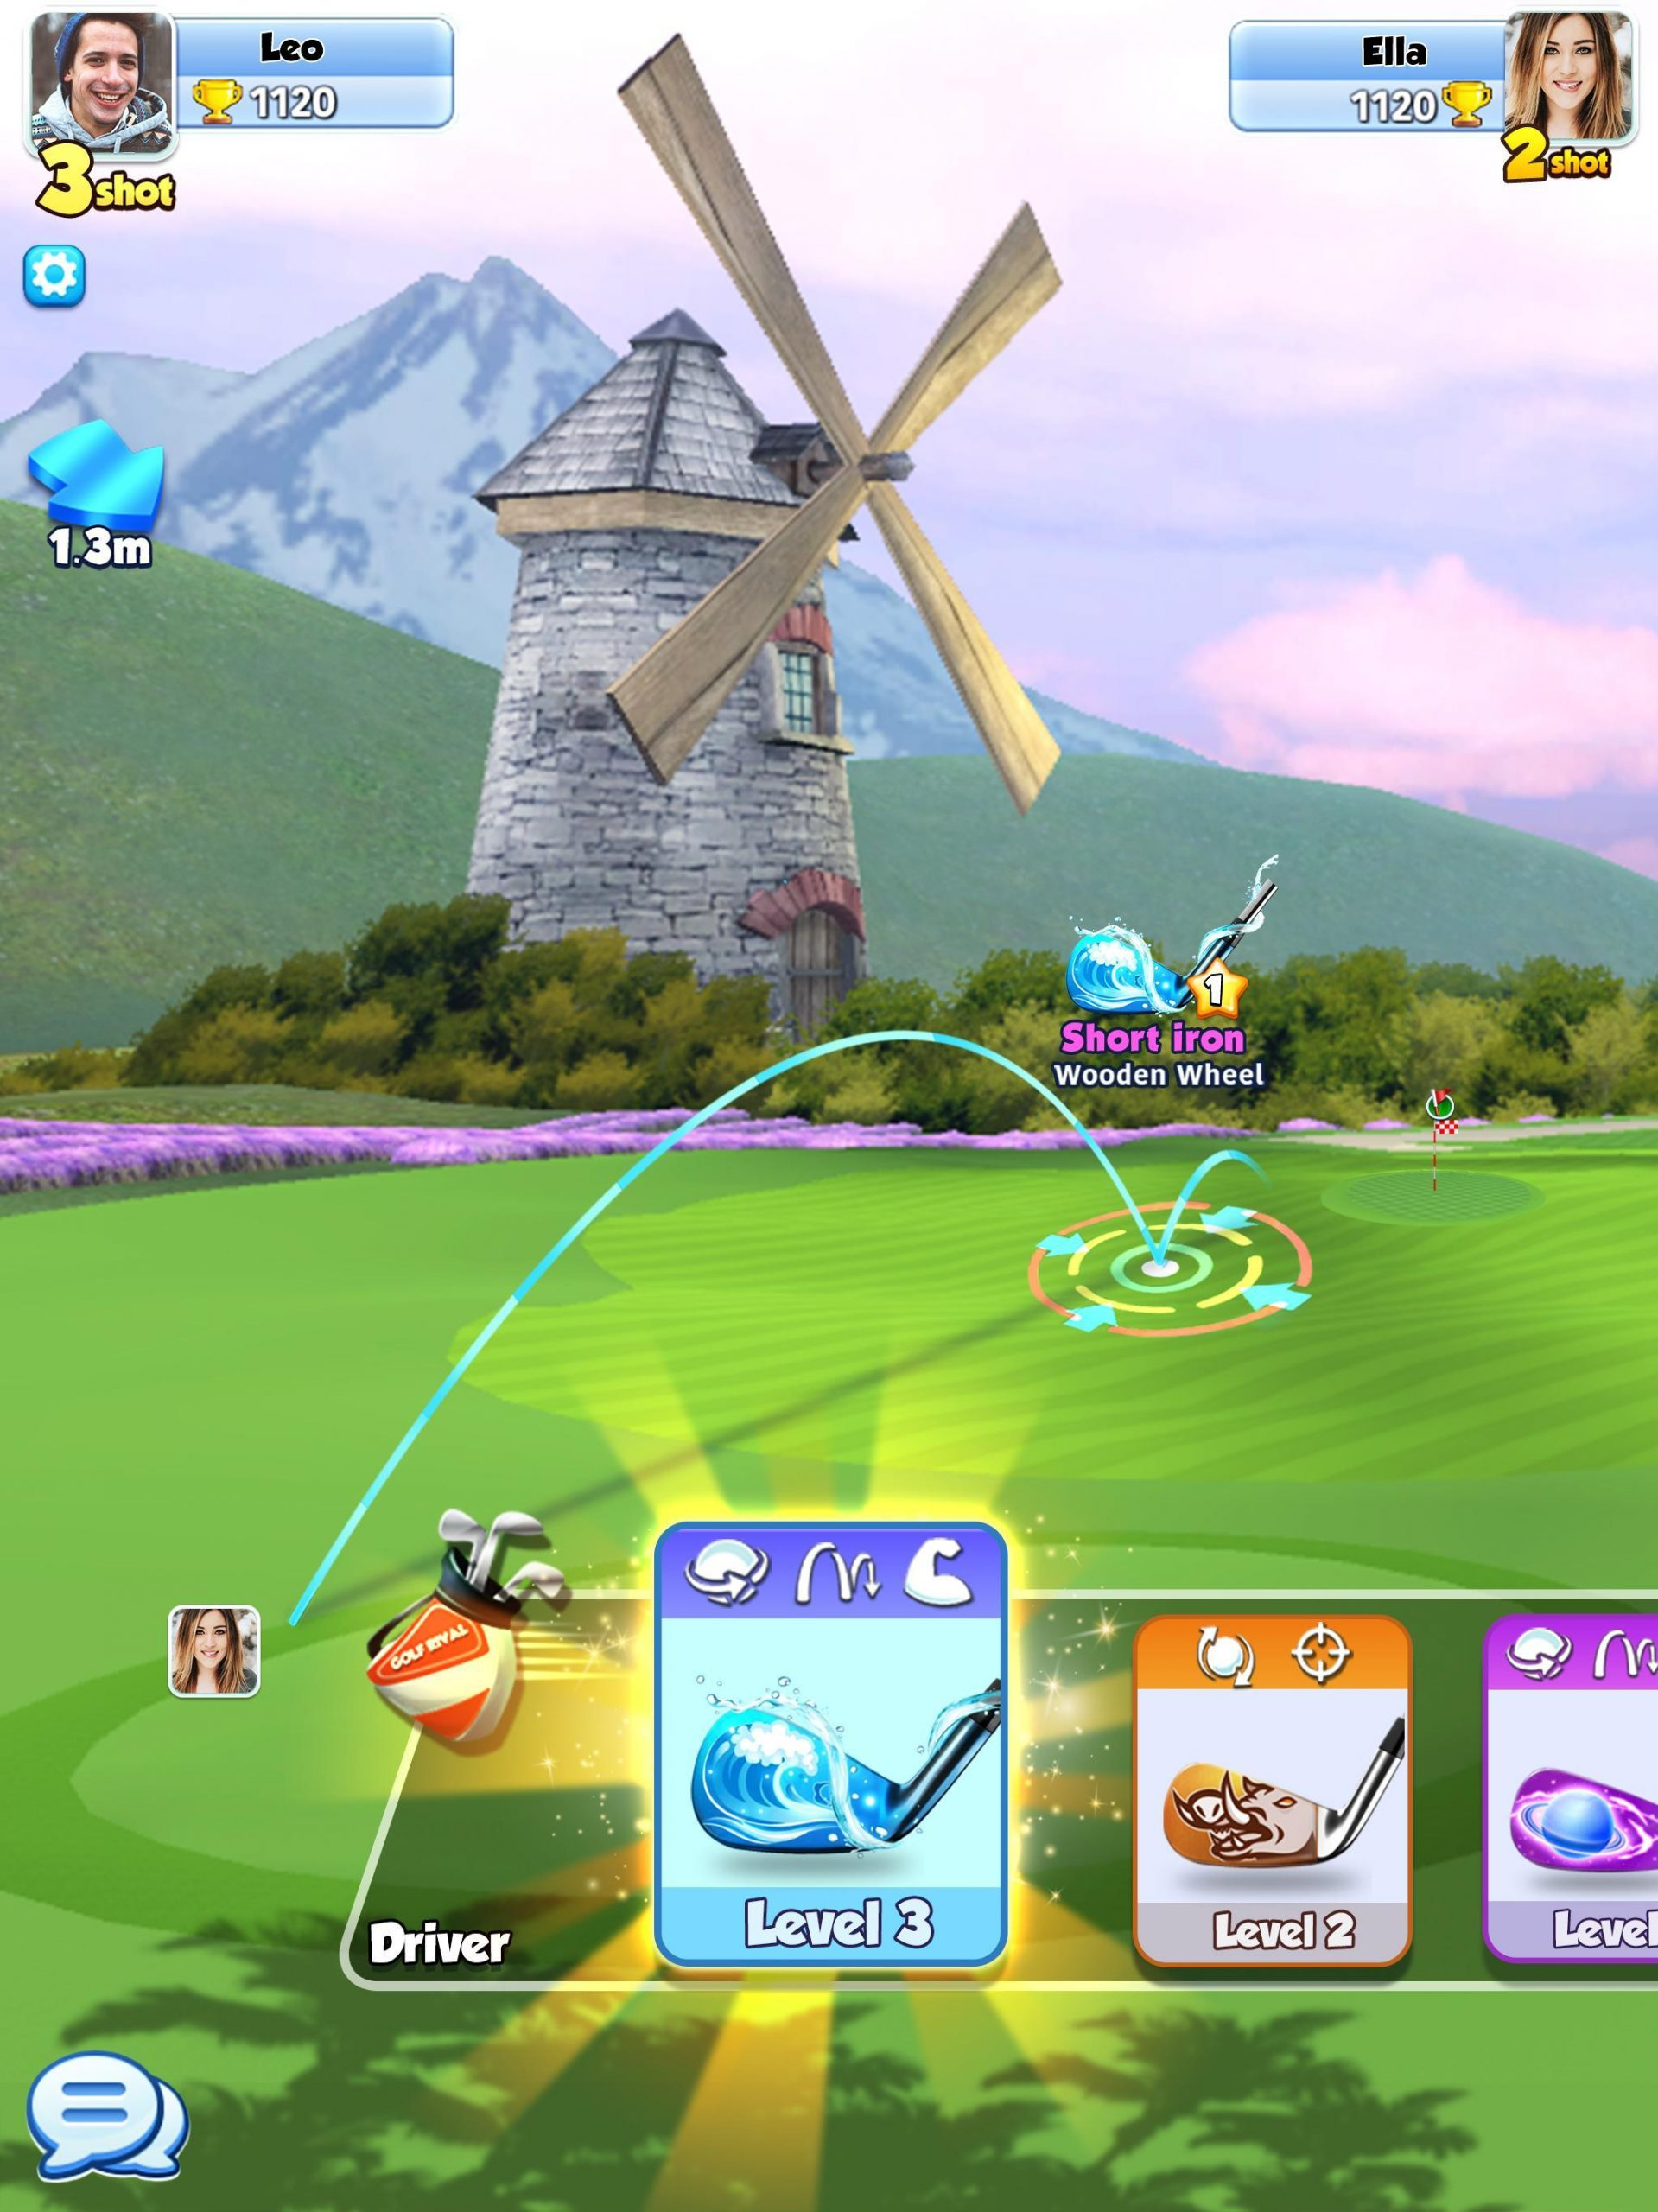 Golf Rival Mod Apk Latest version (Unlimited Money) 4